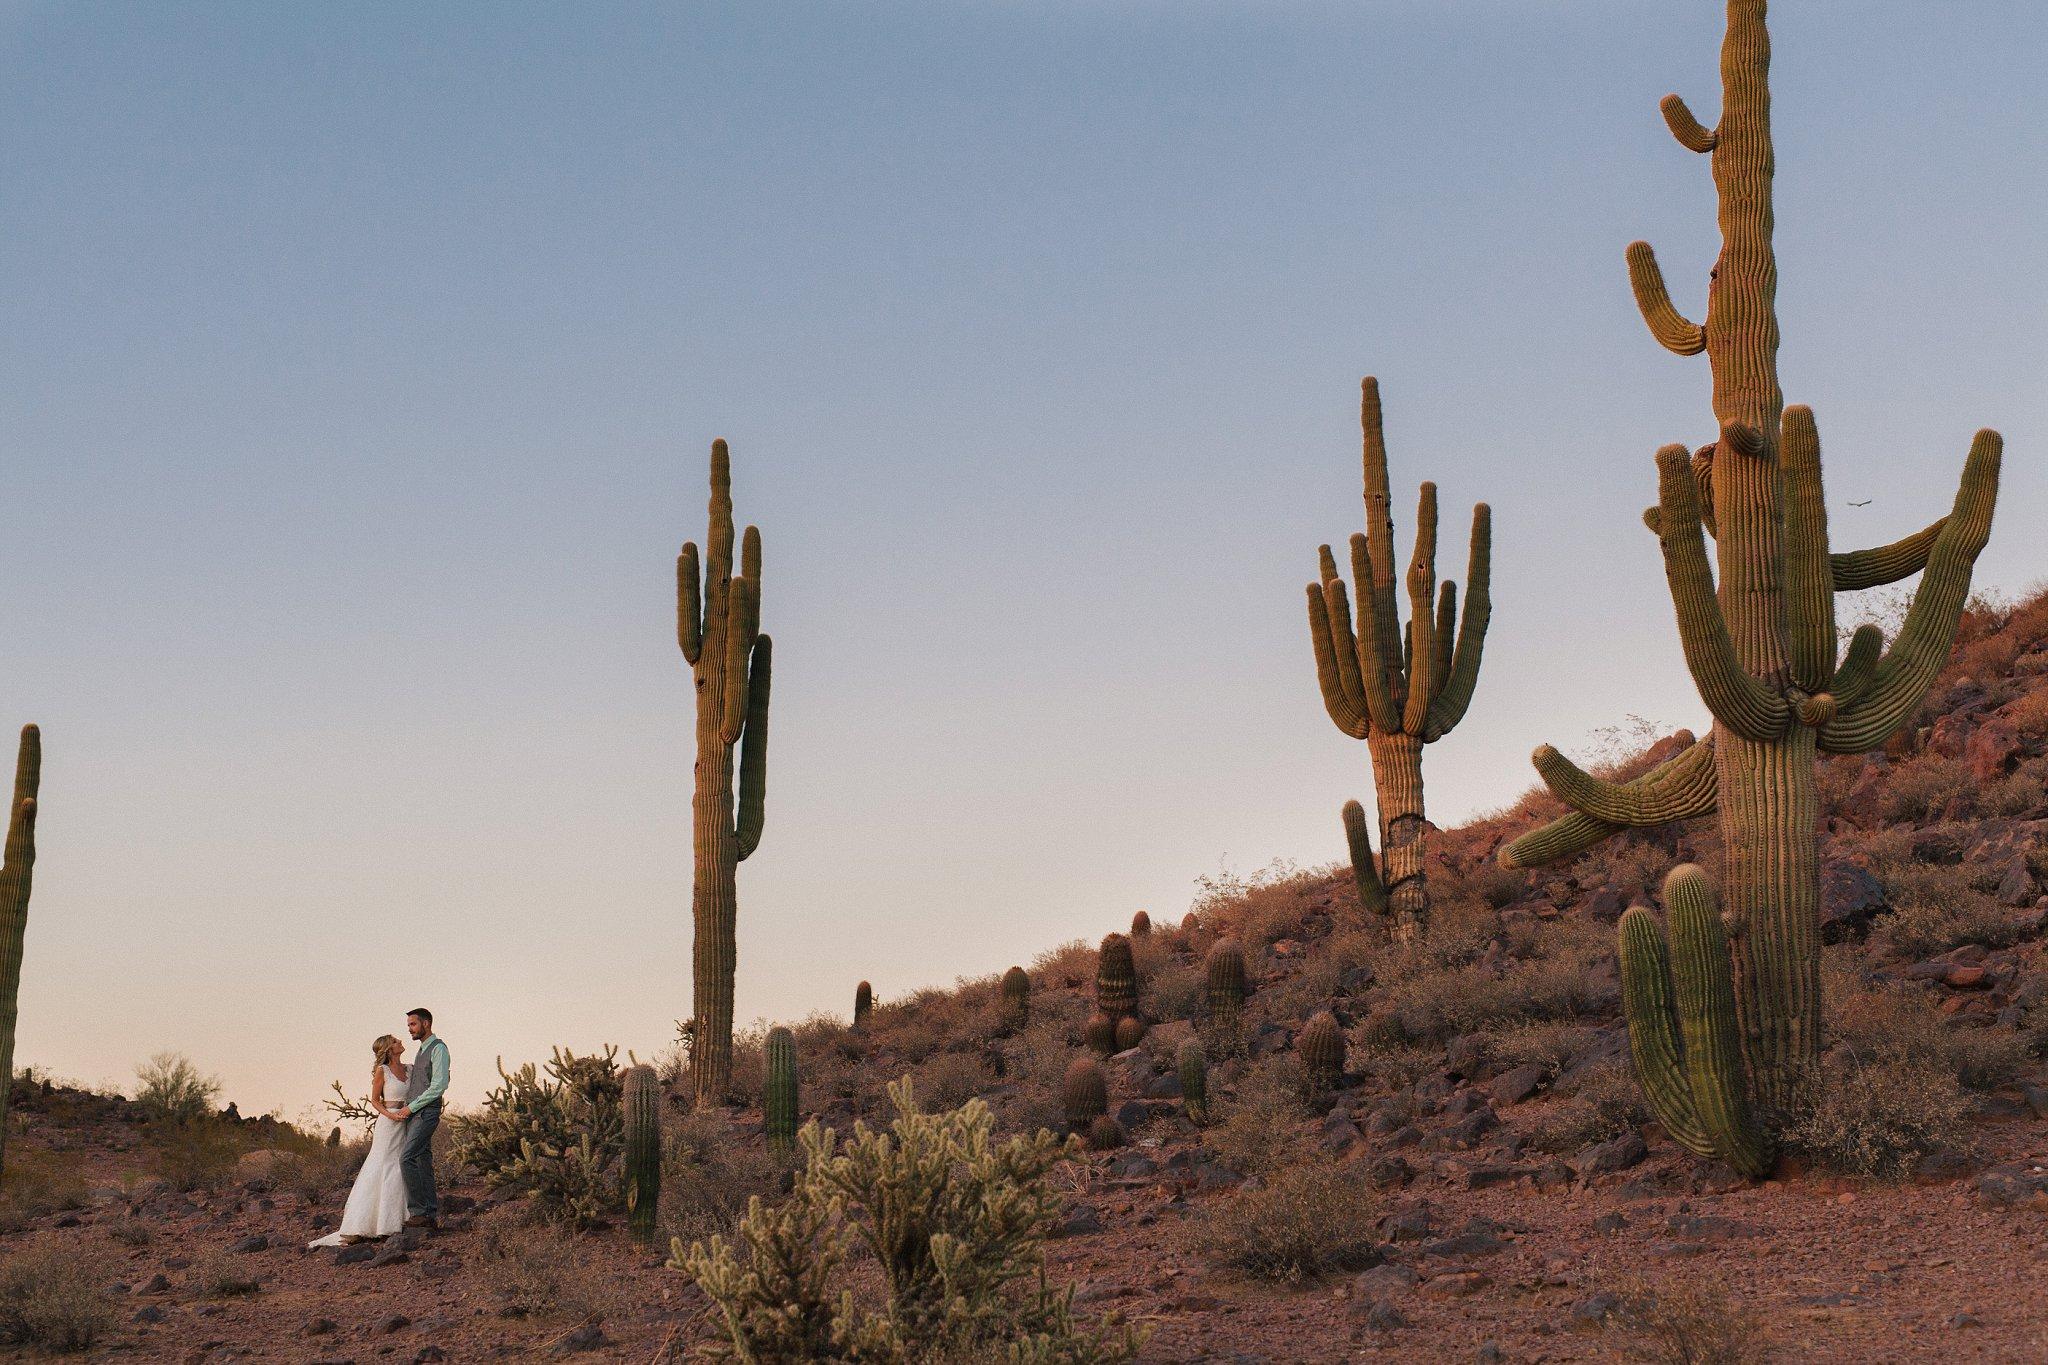 Arizona bride & groom in saguaro desert at sunset